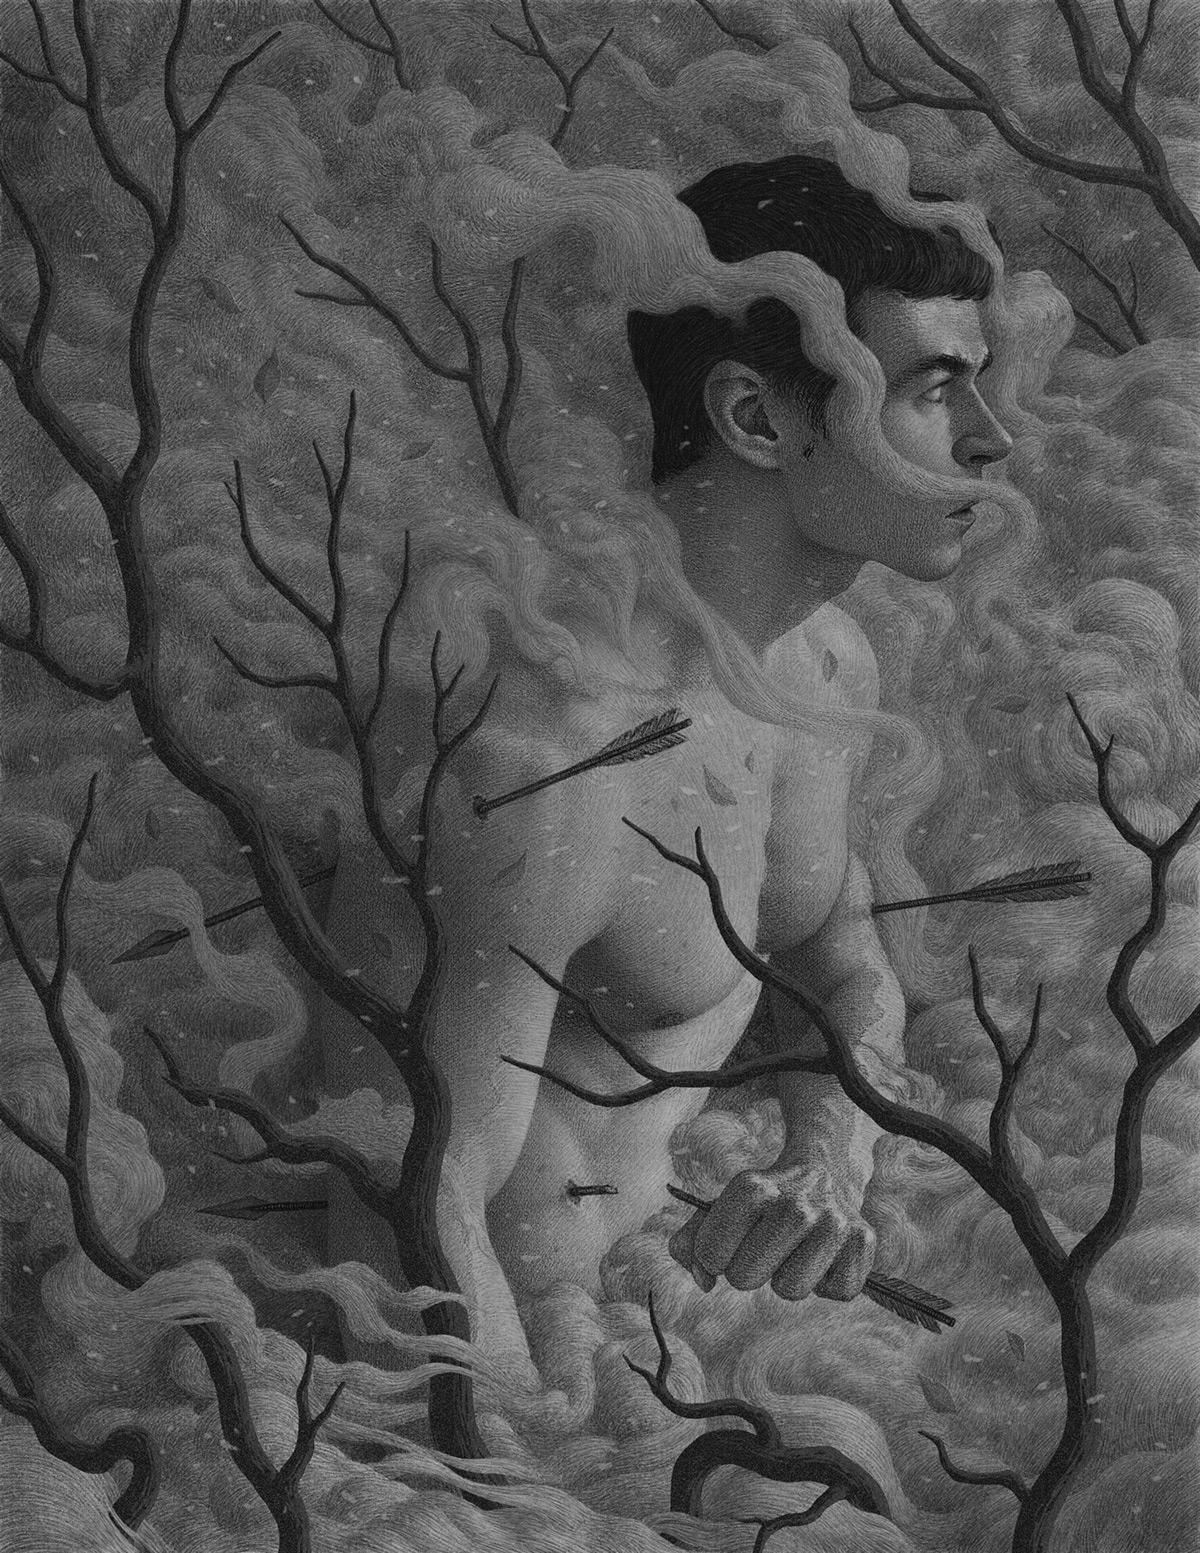 Immortality Illustration by Boris Pelcer